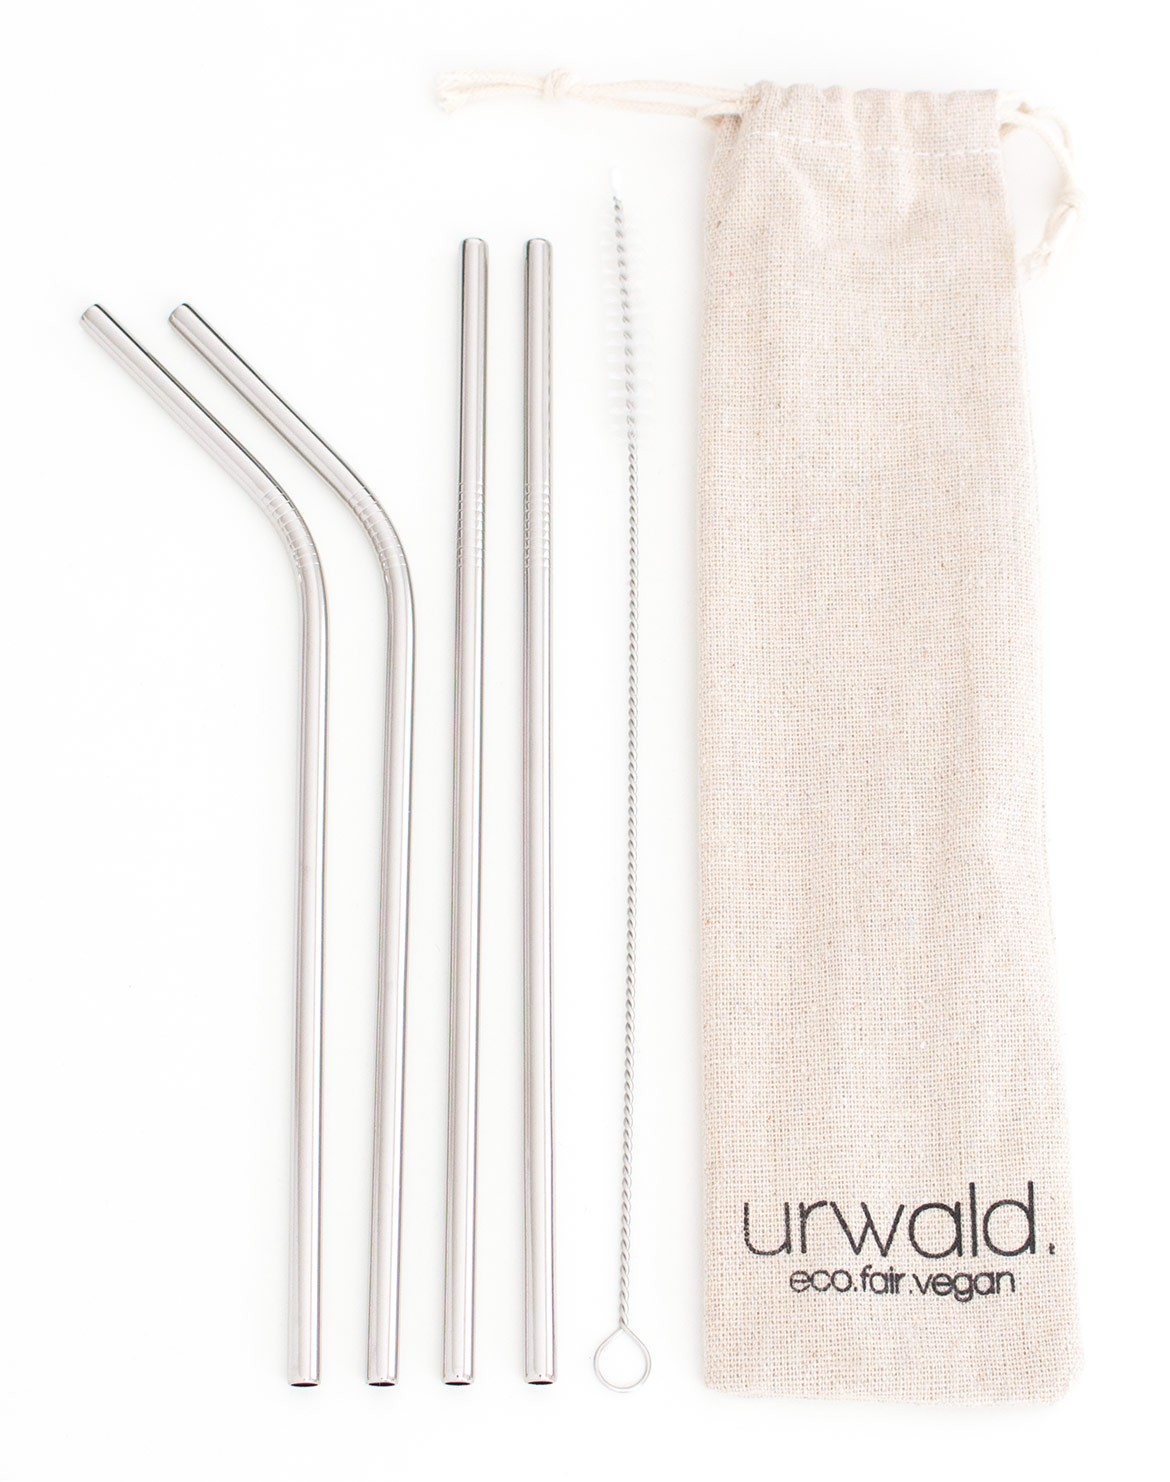 Stainless Steel Straw Set 4 pcs. + Brush silver